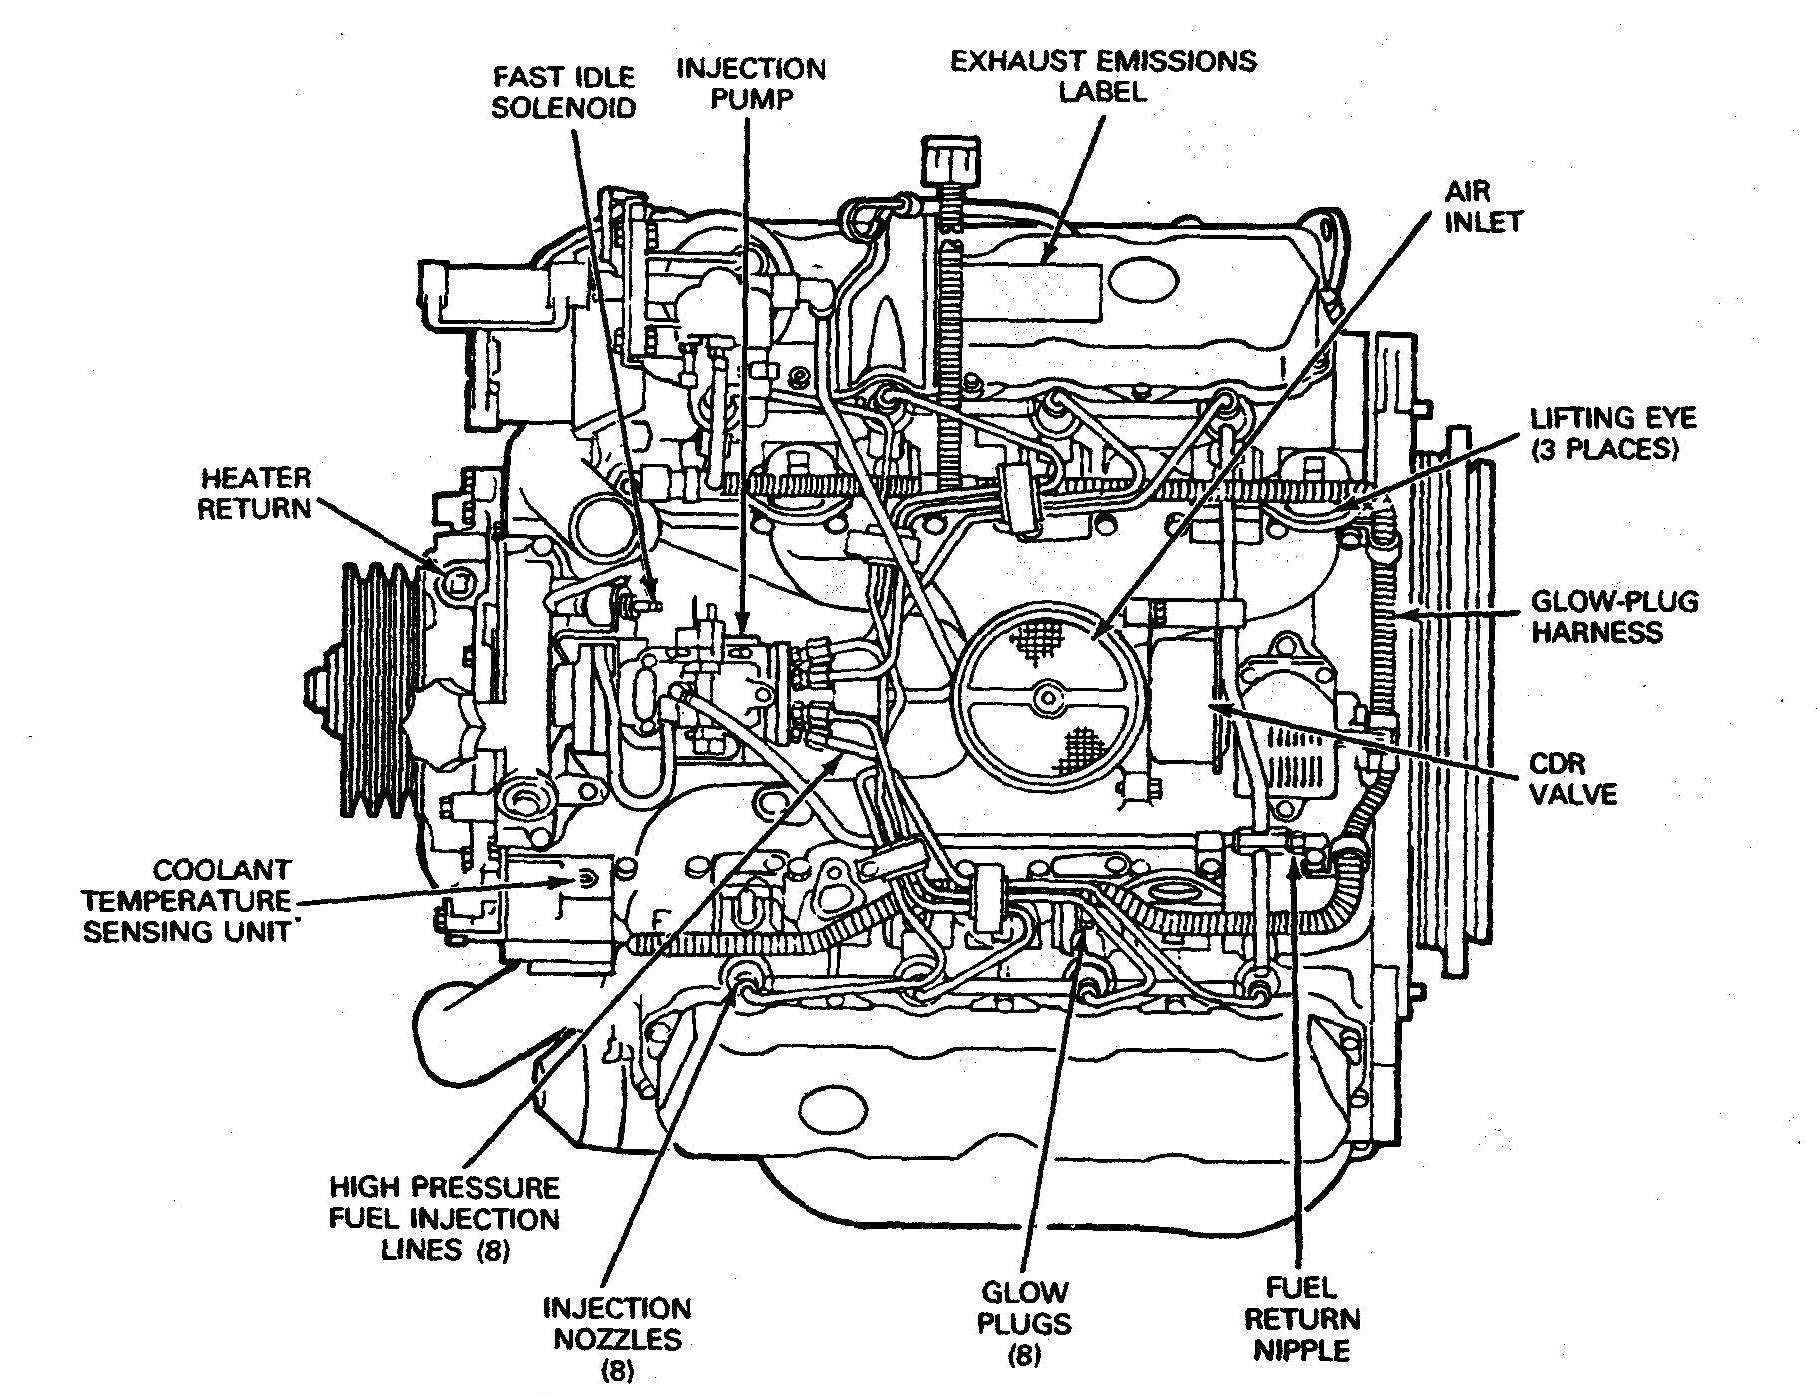 Simple Car Engine Diagram Automotive Engine Diagram Wiring Diagrams Of Simple Car Engine Diagram